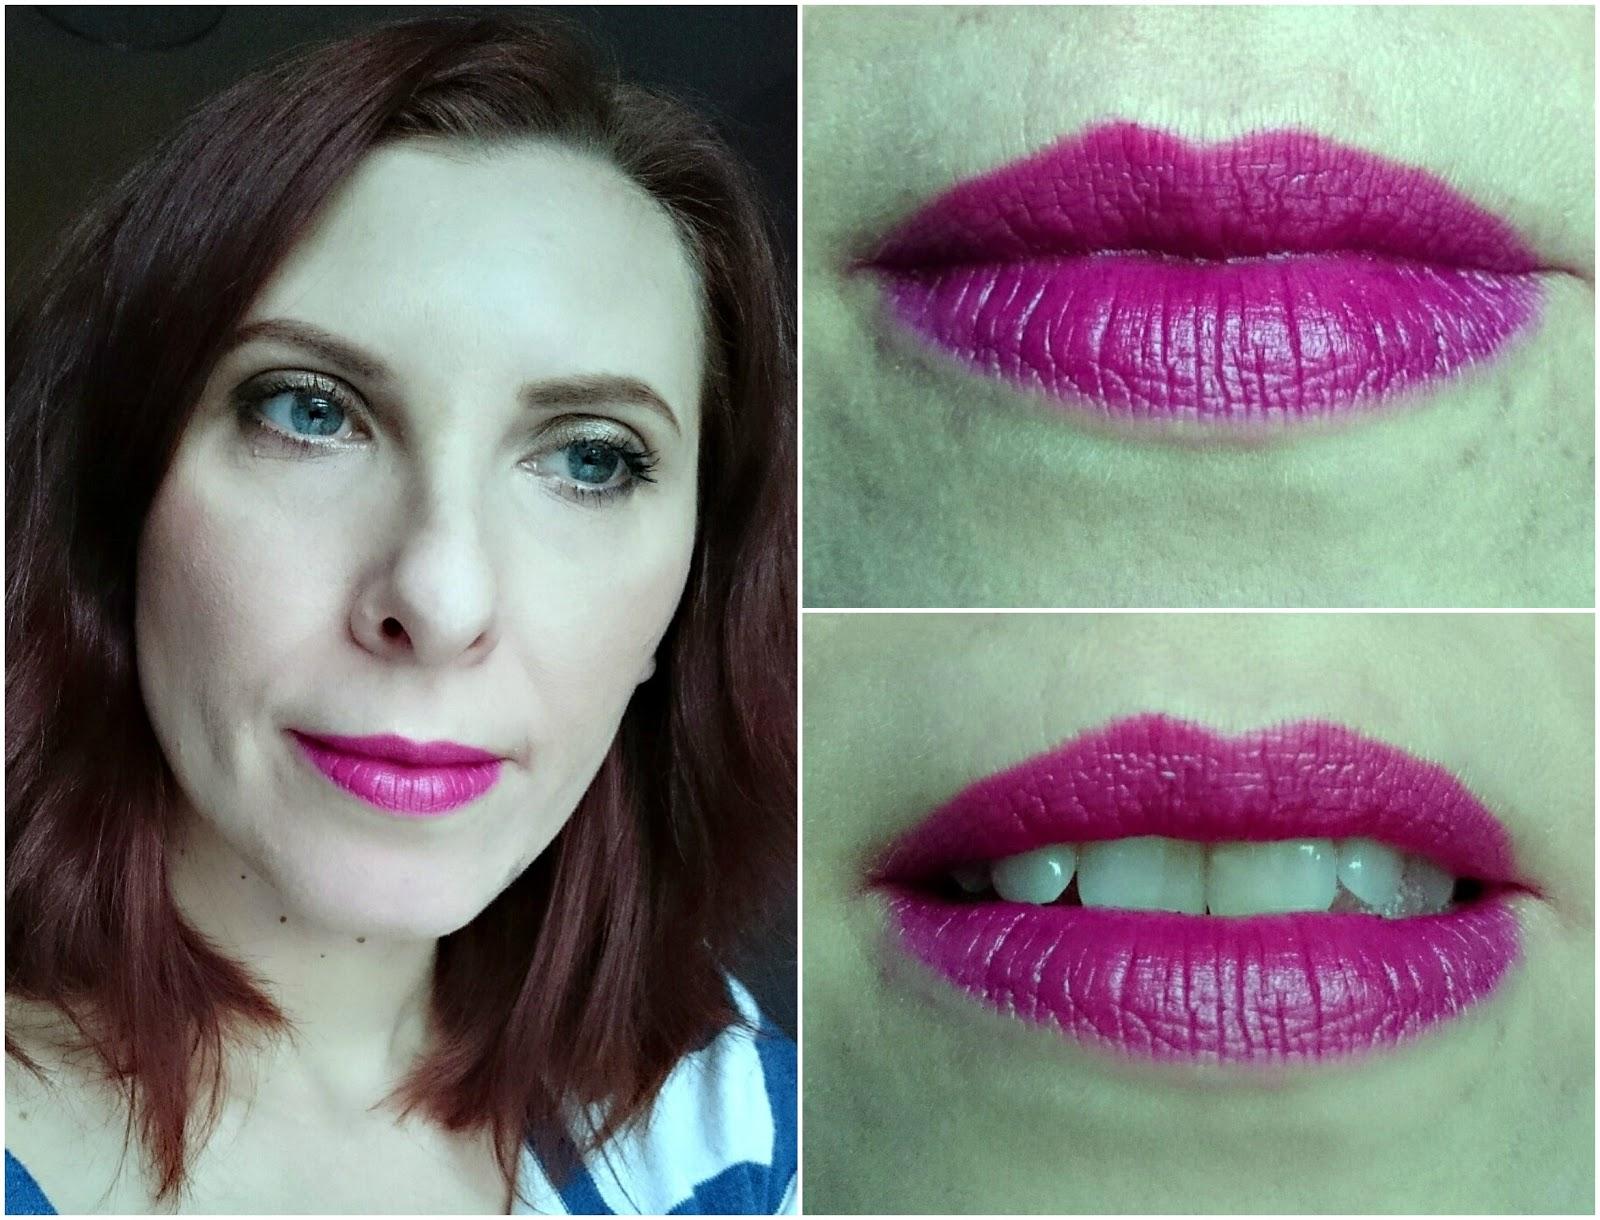 Milani Colour Statement Lipstick in Sangria